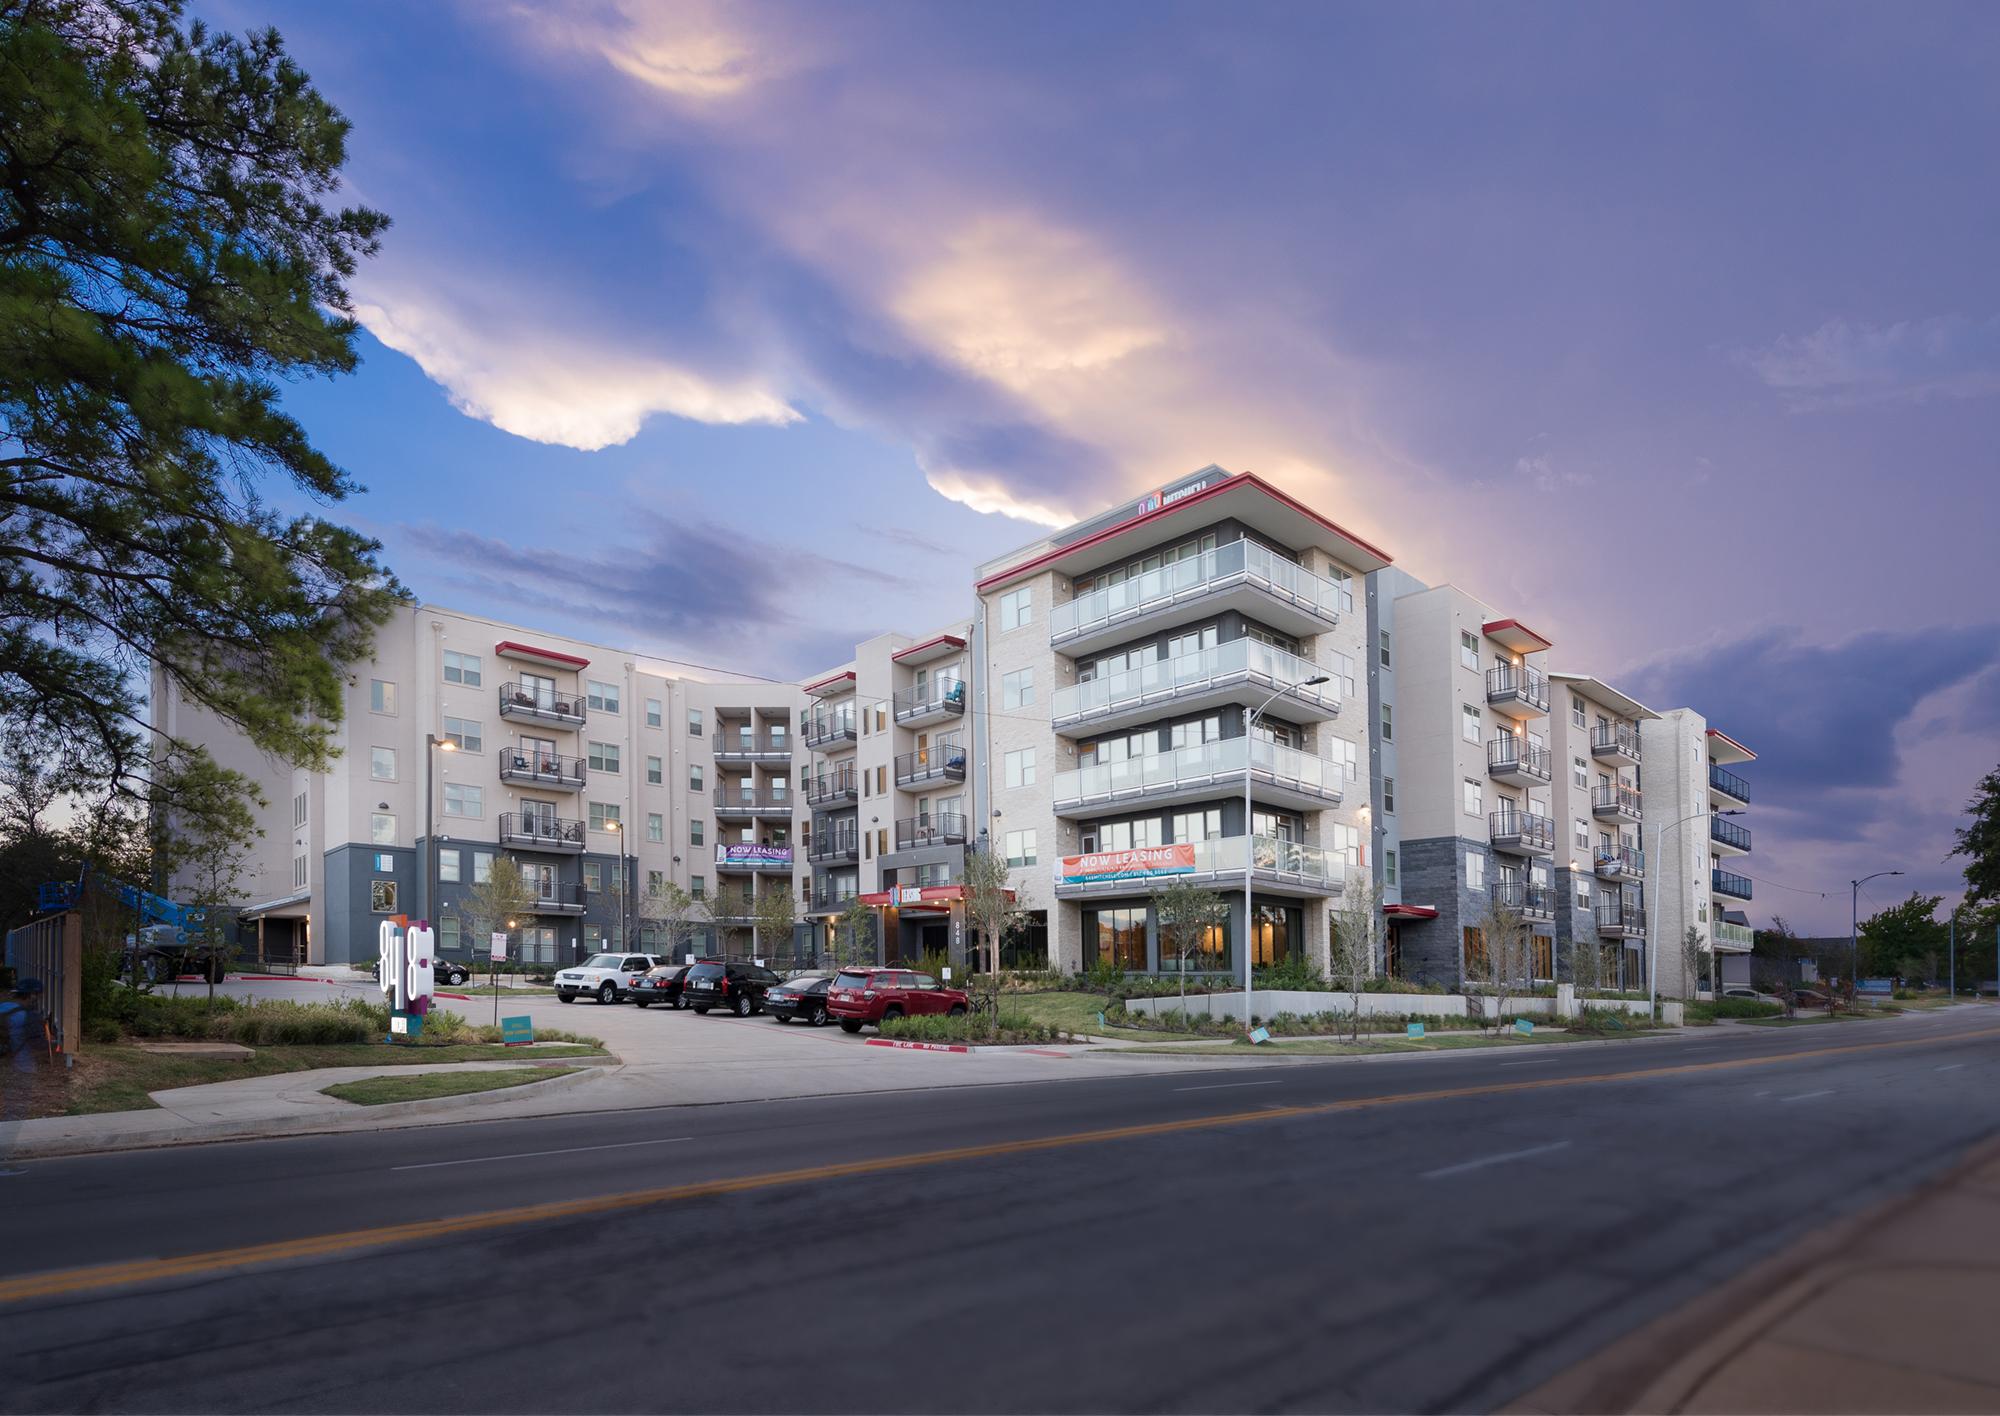 848 Mitchell Student Housing